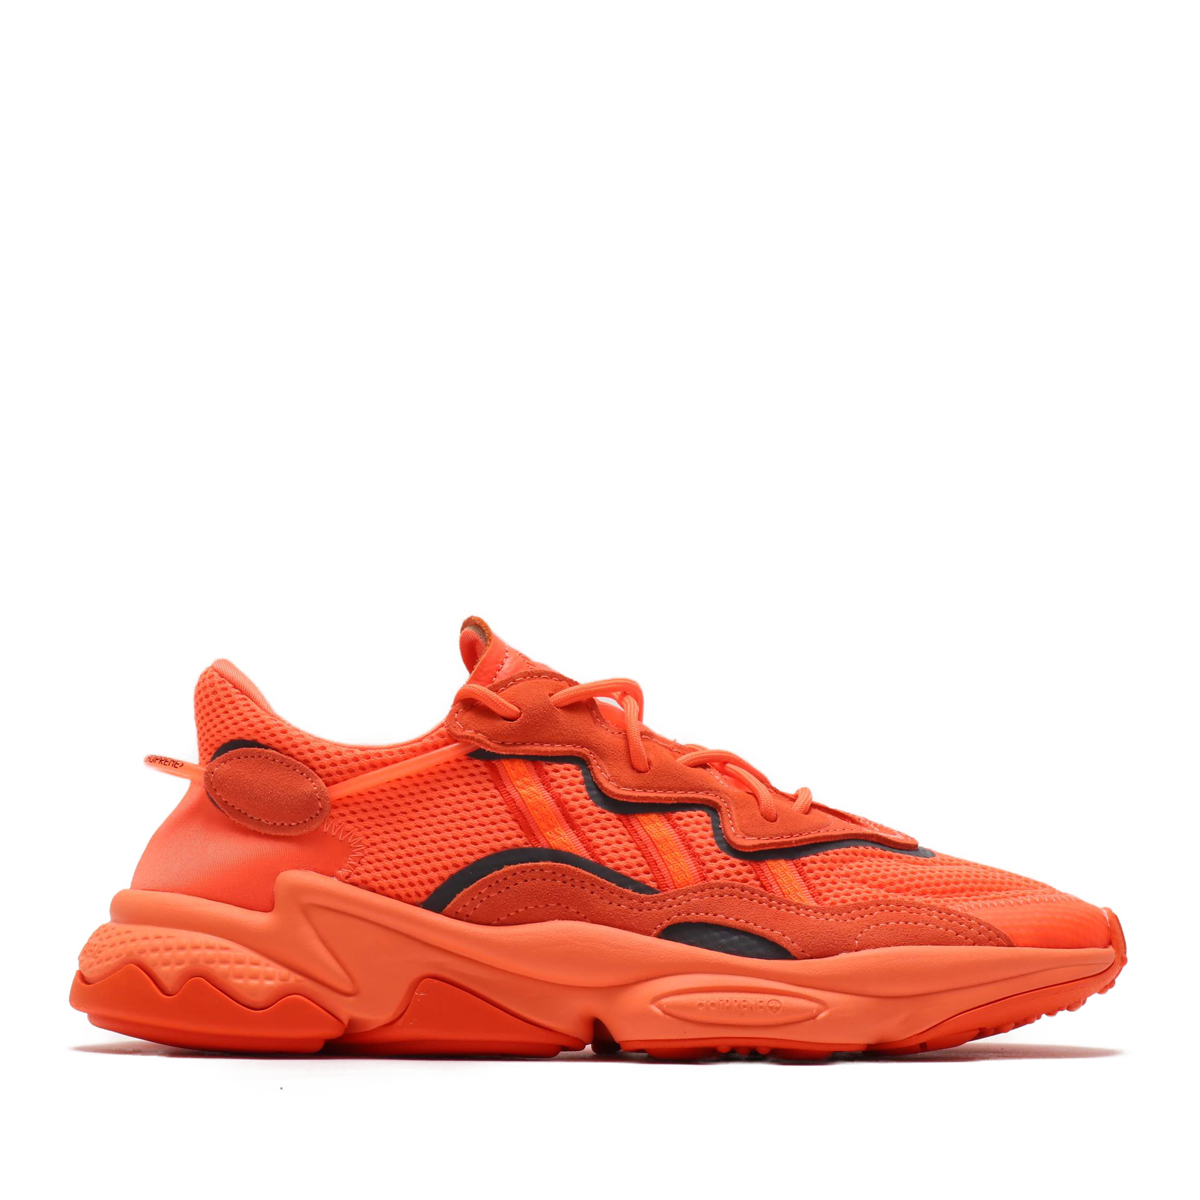 adidas ozweego noir orange